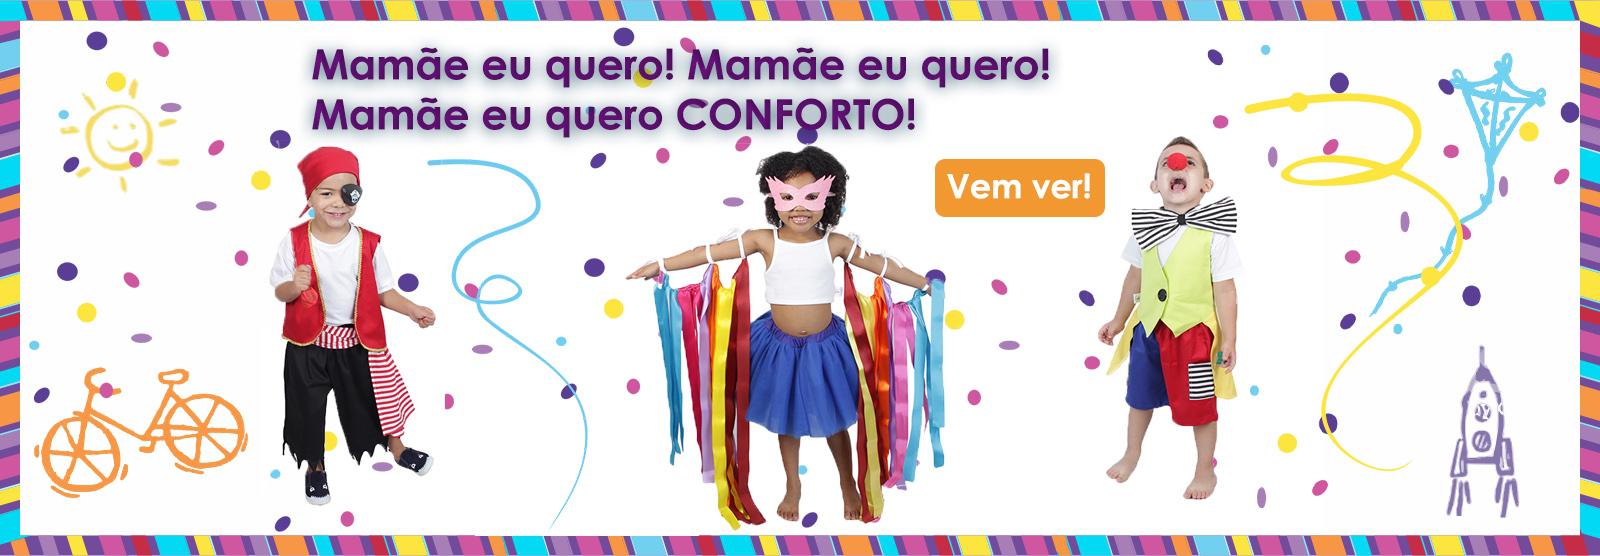 Carnaval - 2020